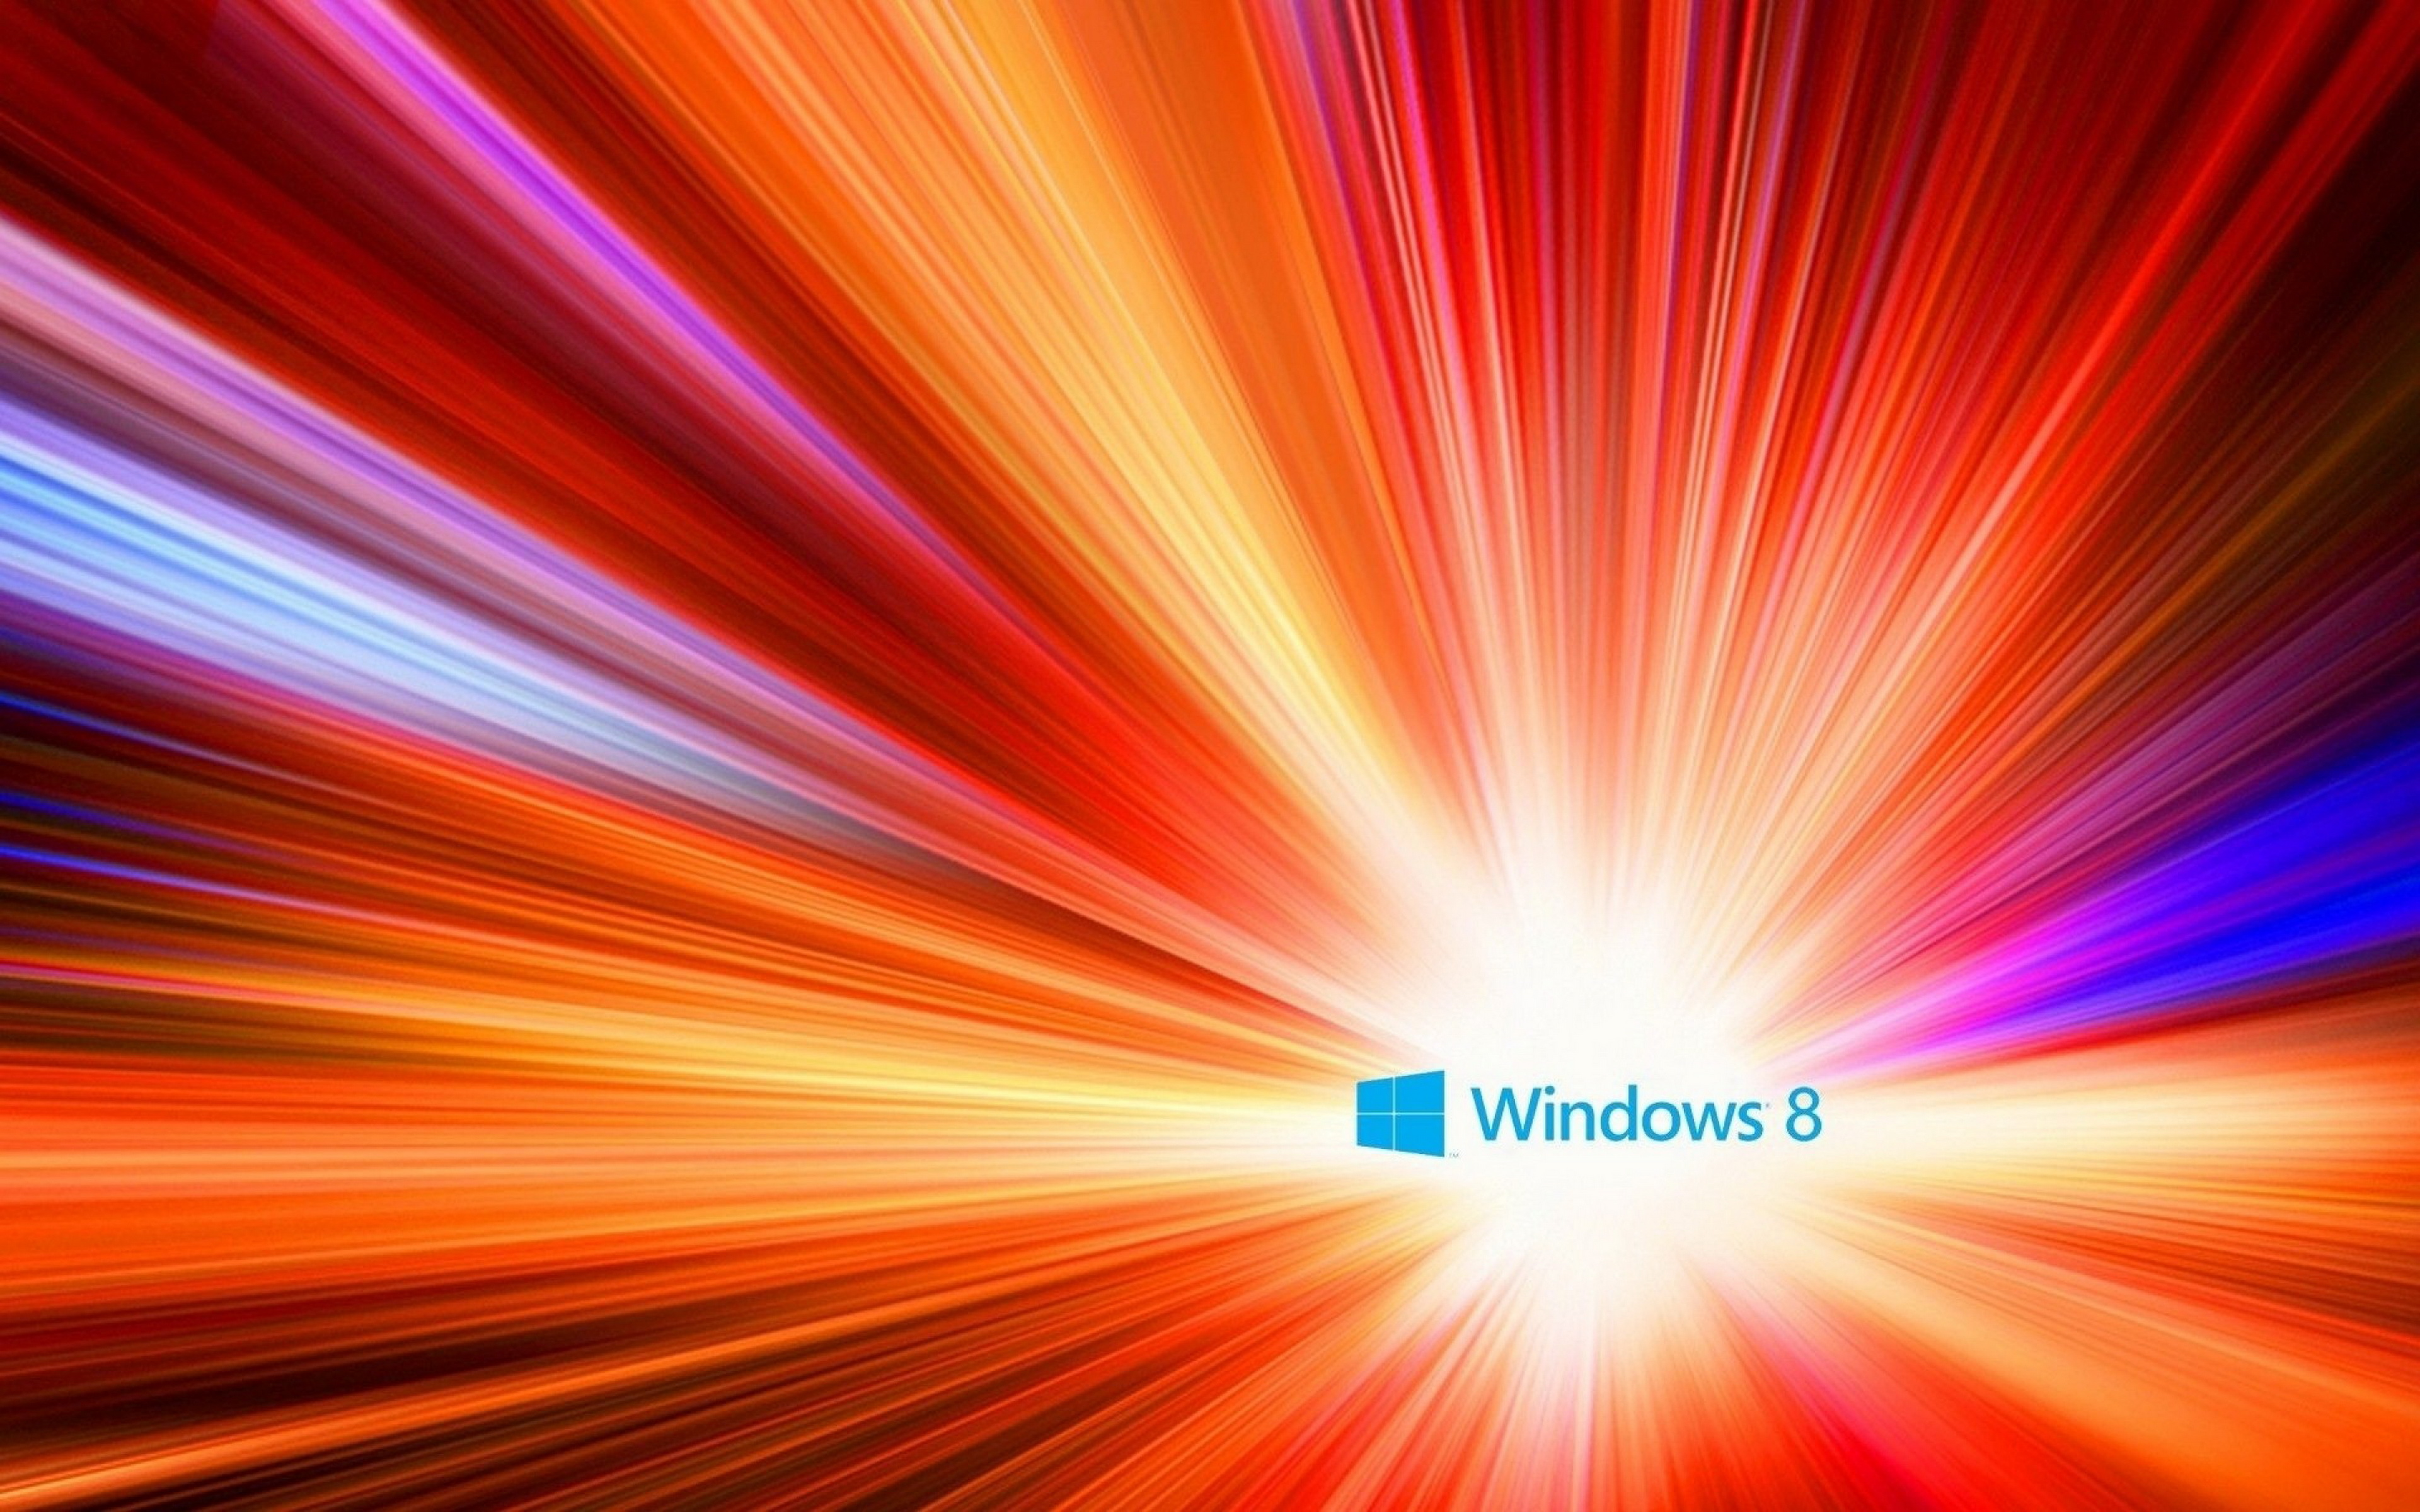 4k Ultra Hd Wallpaper Windows: Windows 8 4k Ultra HD Wallpaper